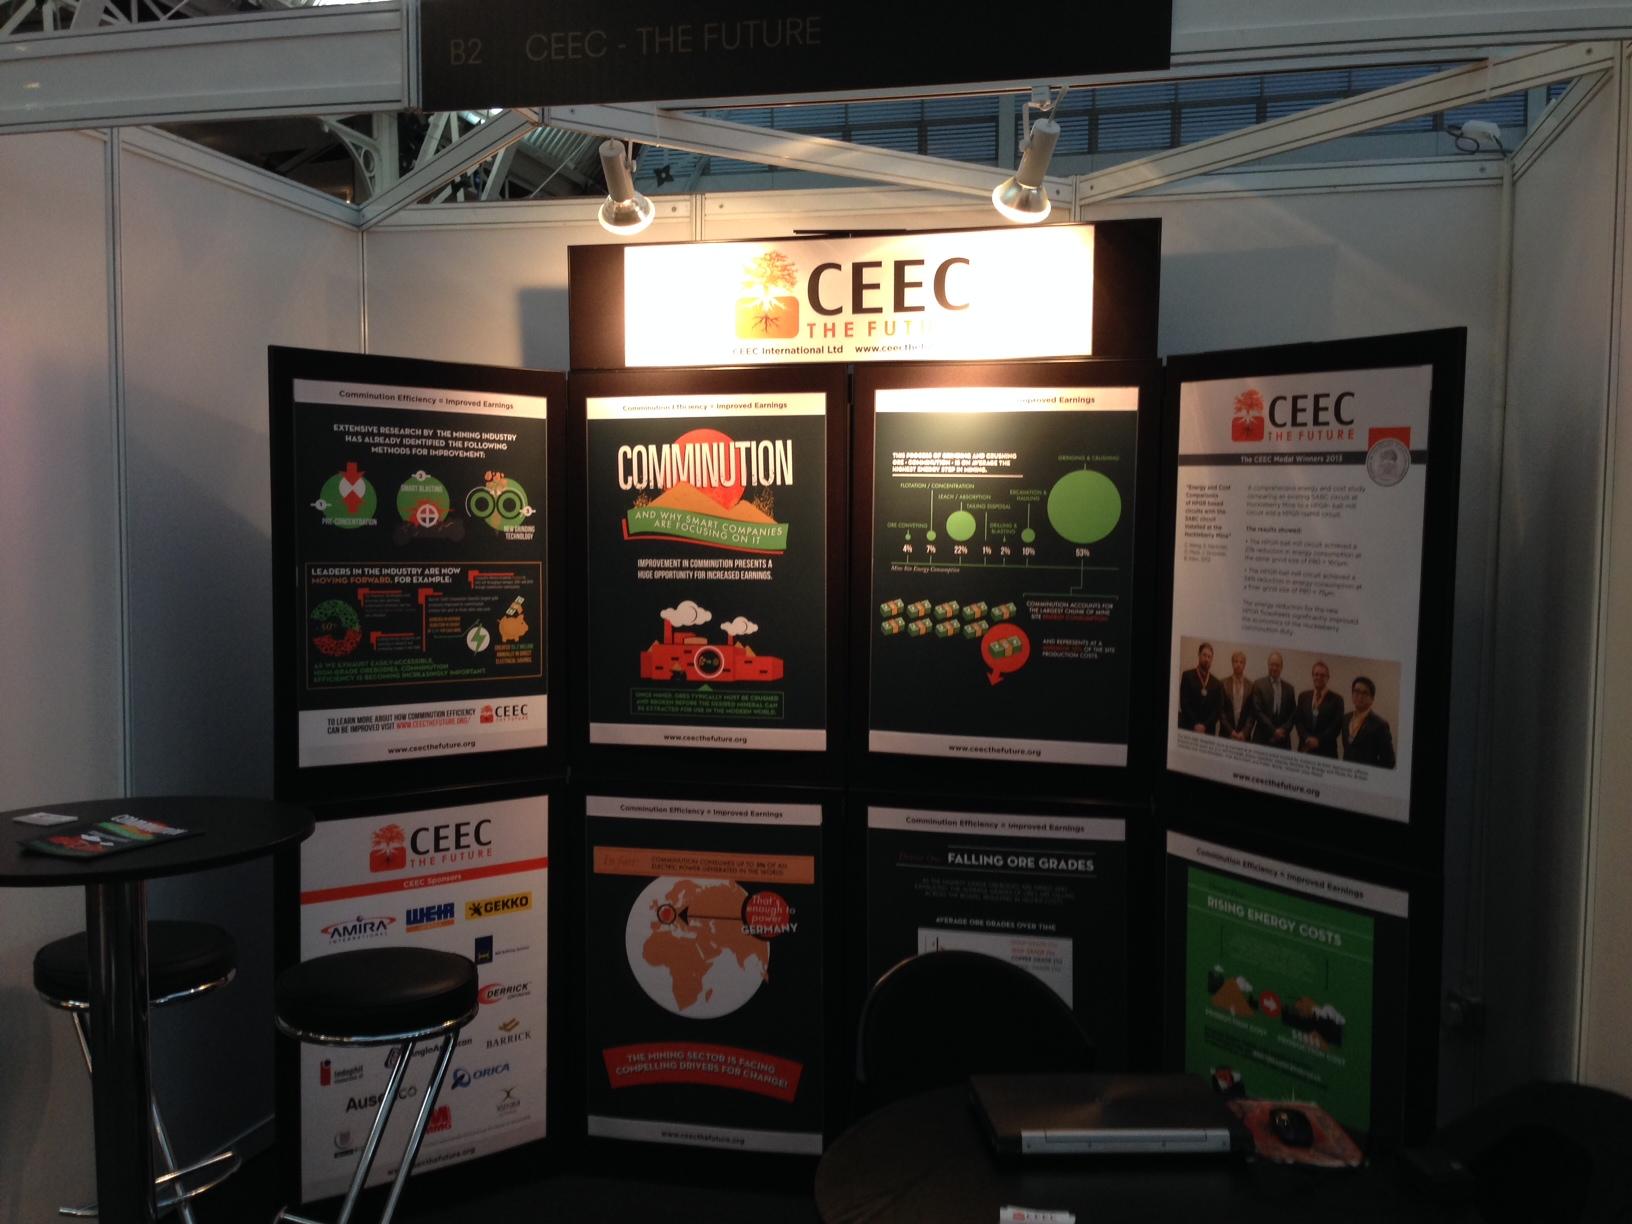 CEEC participates in Mines and Money London 2013 - CEEC (Coalition